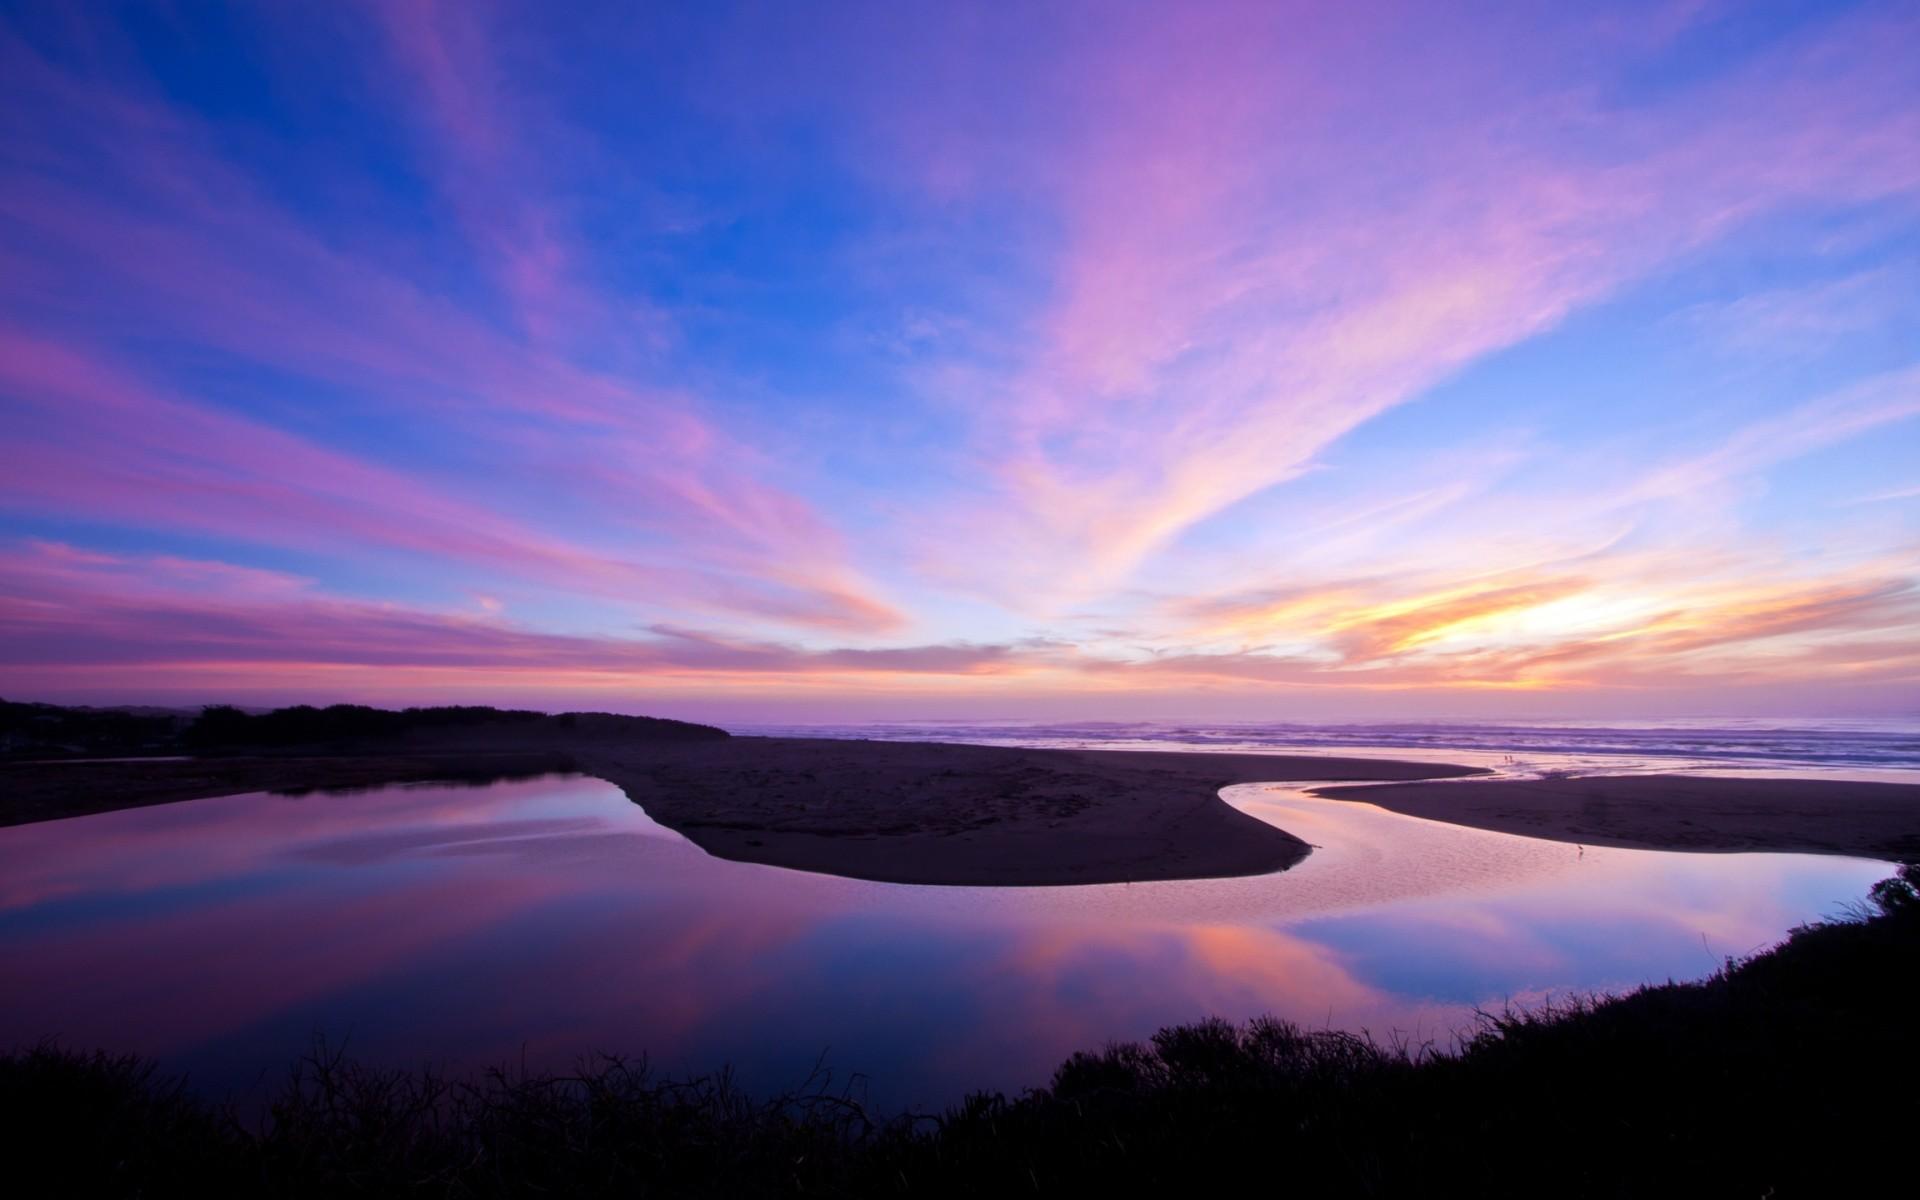 Free North Salmon Creek Beach Reflection phone wallpaper by aloggins84